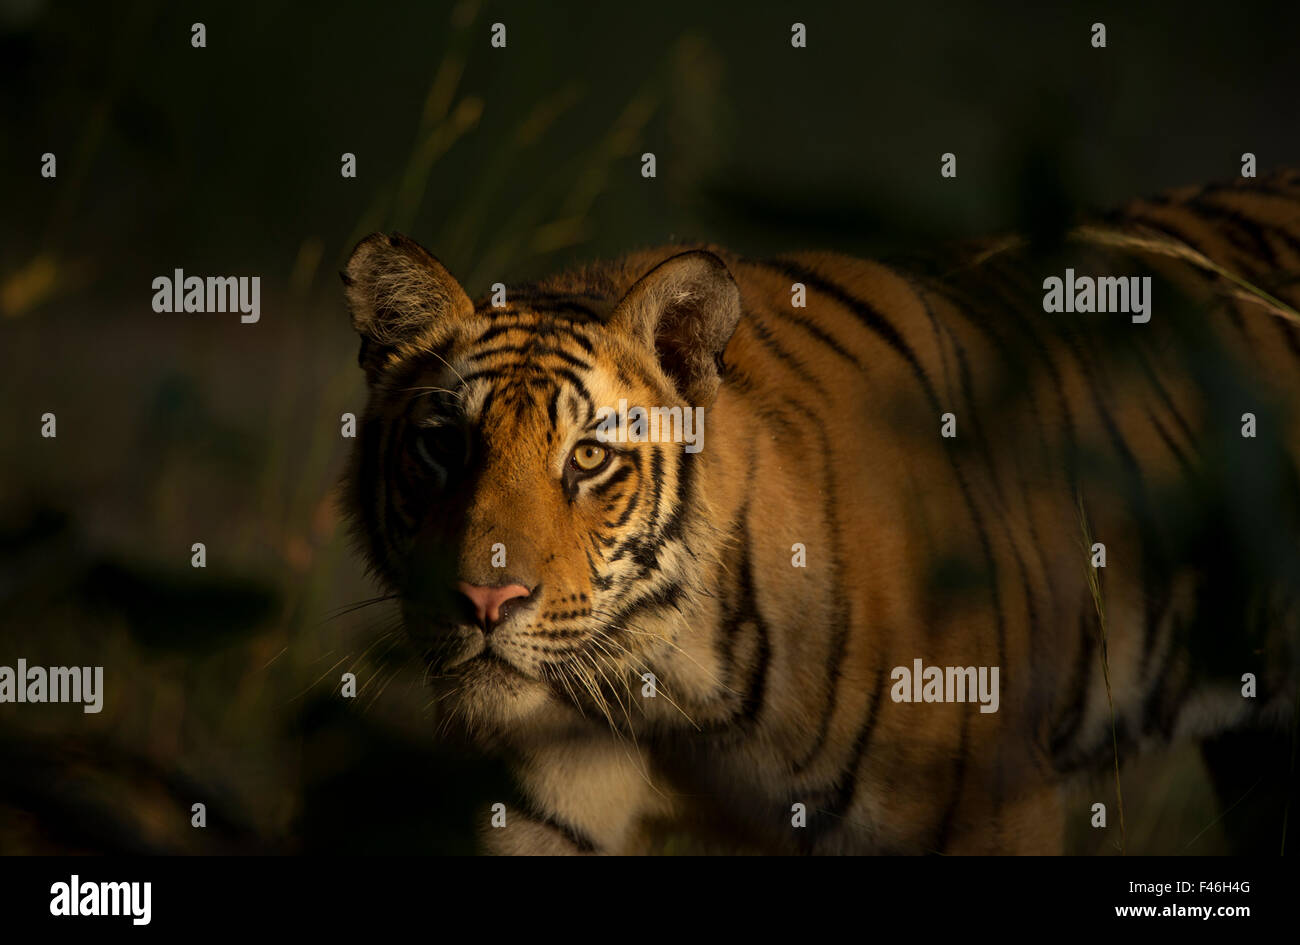 Bengal Tiger (Panthera tigris) sub-adult, approximately 17-19 months old, lit by morning light, stalking. Endangered. - Stock Image